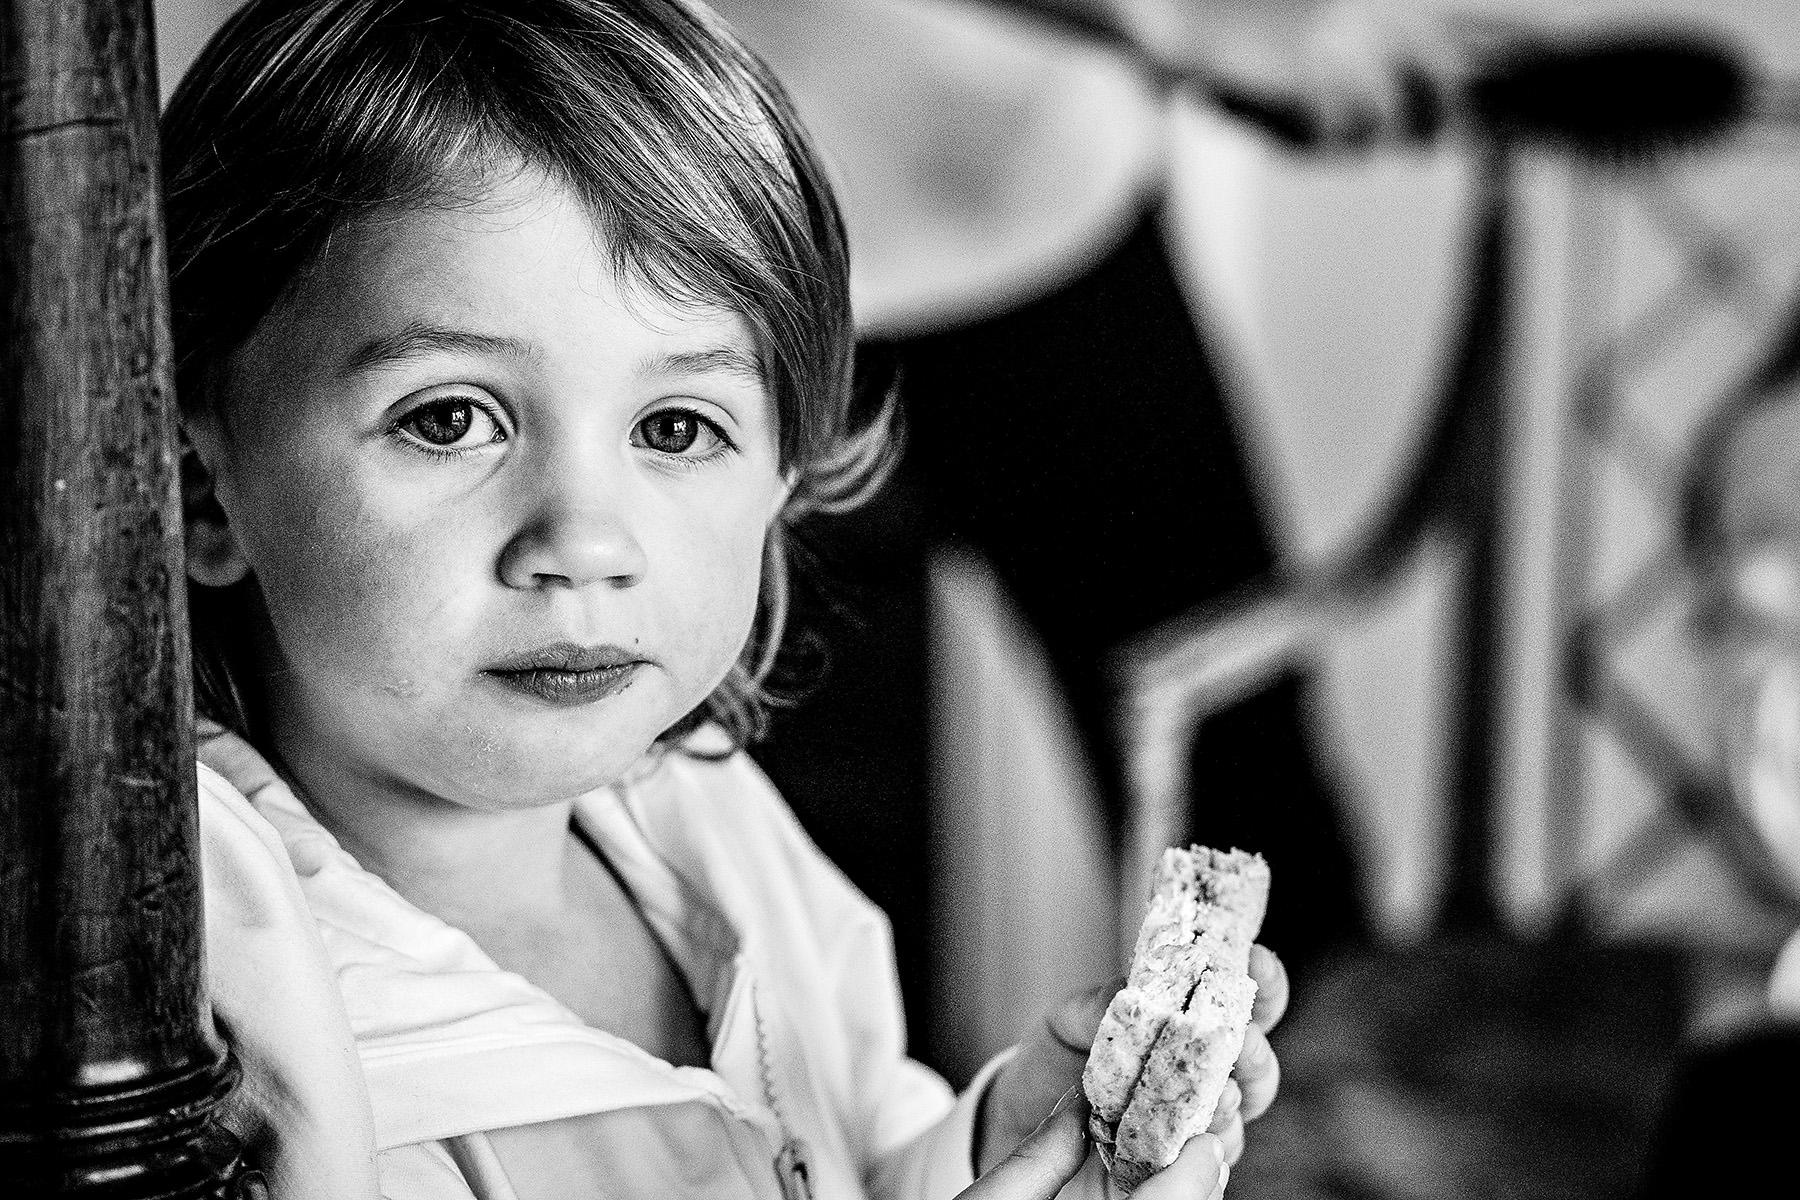 kid eating a sandwich